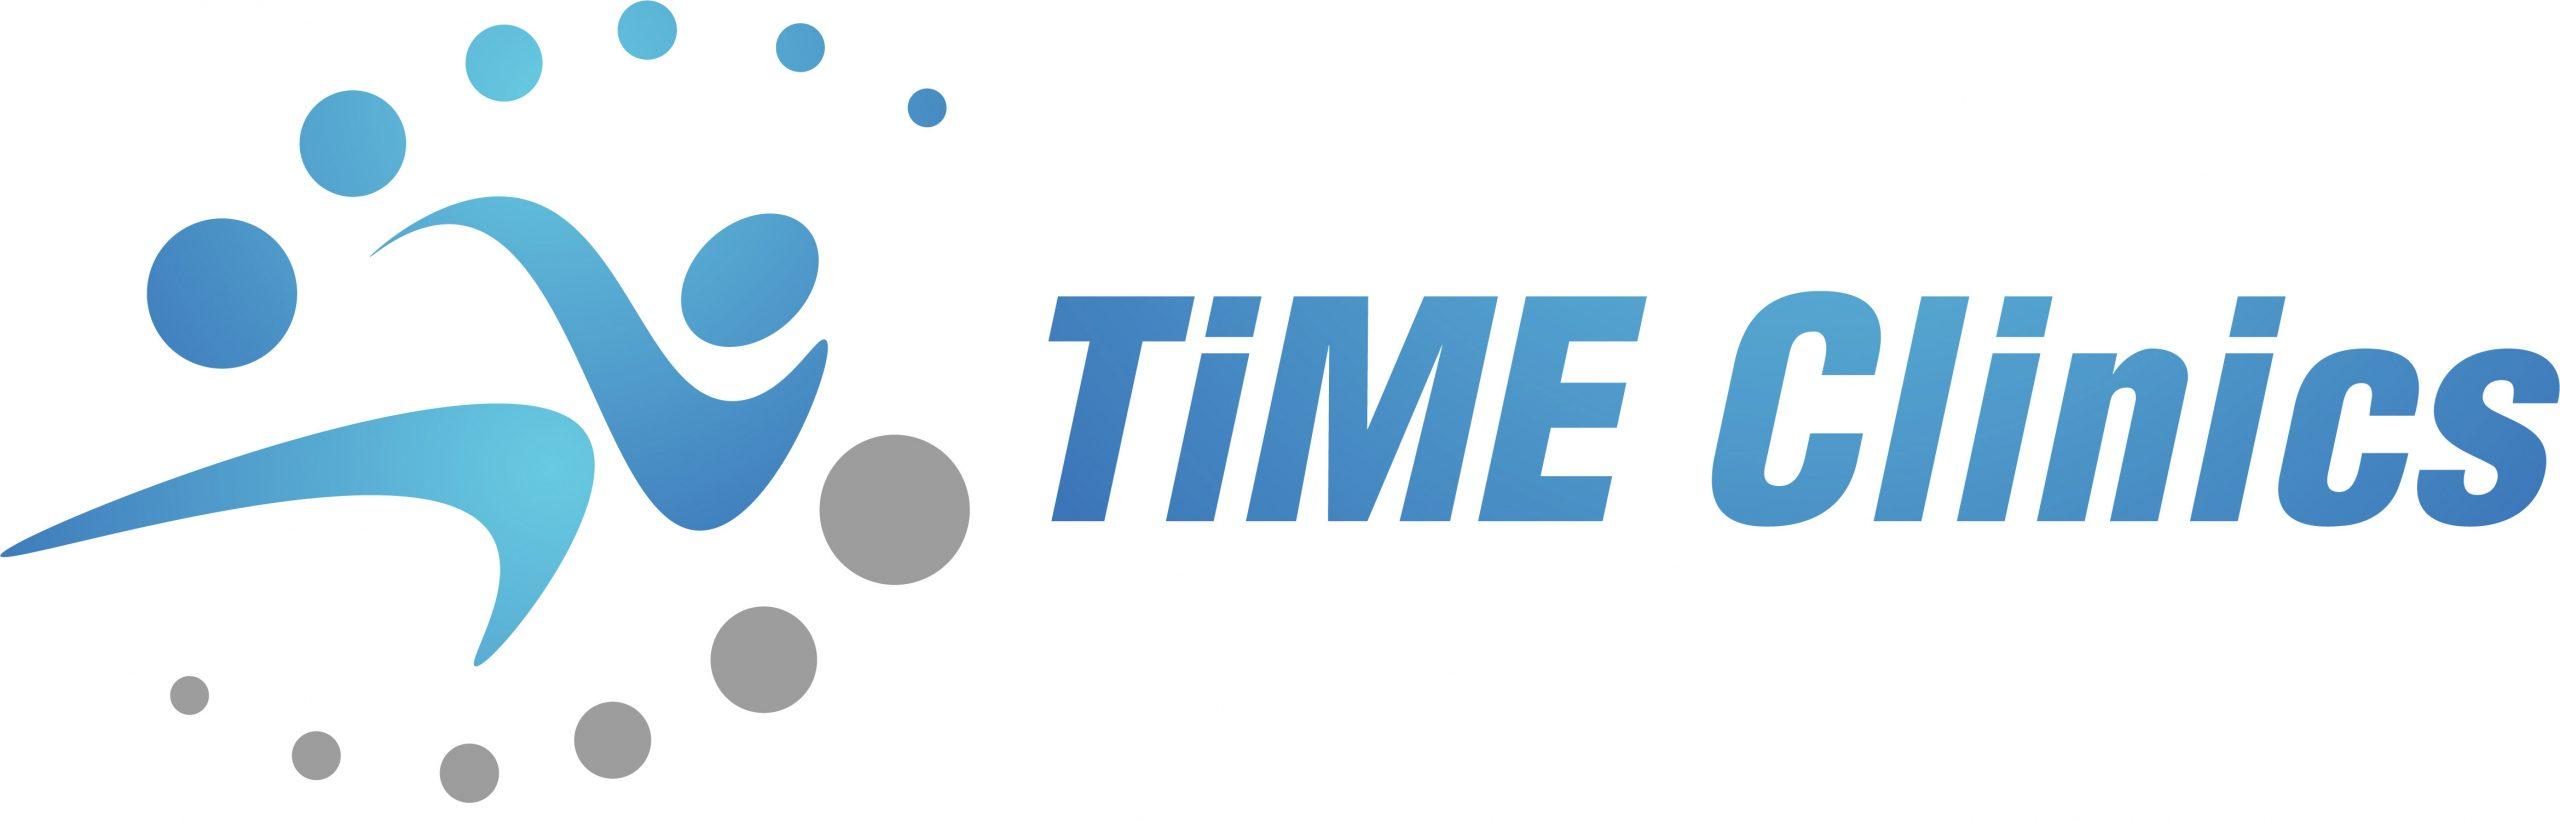 TiME Clinics